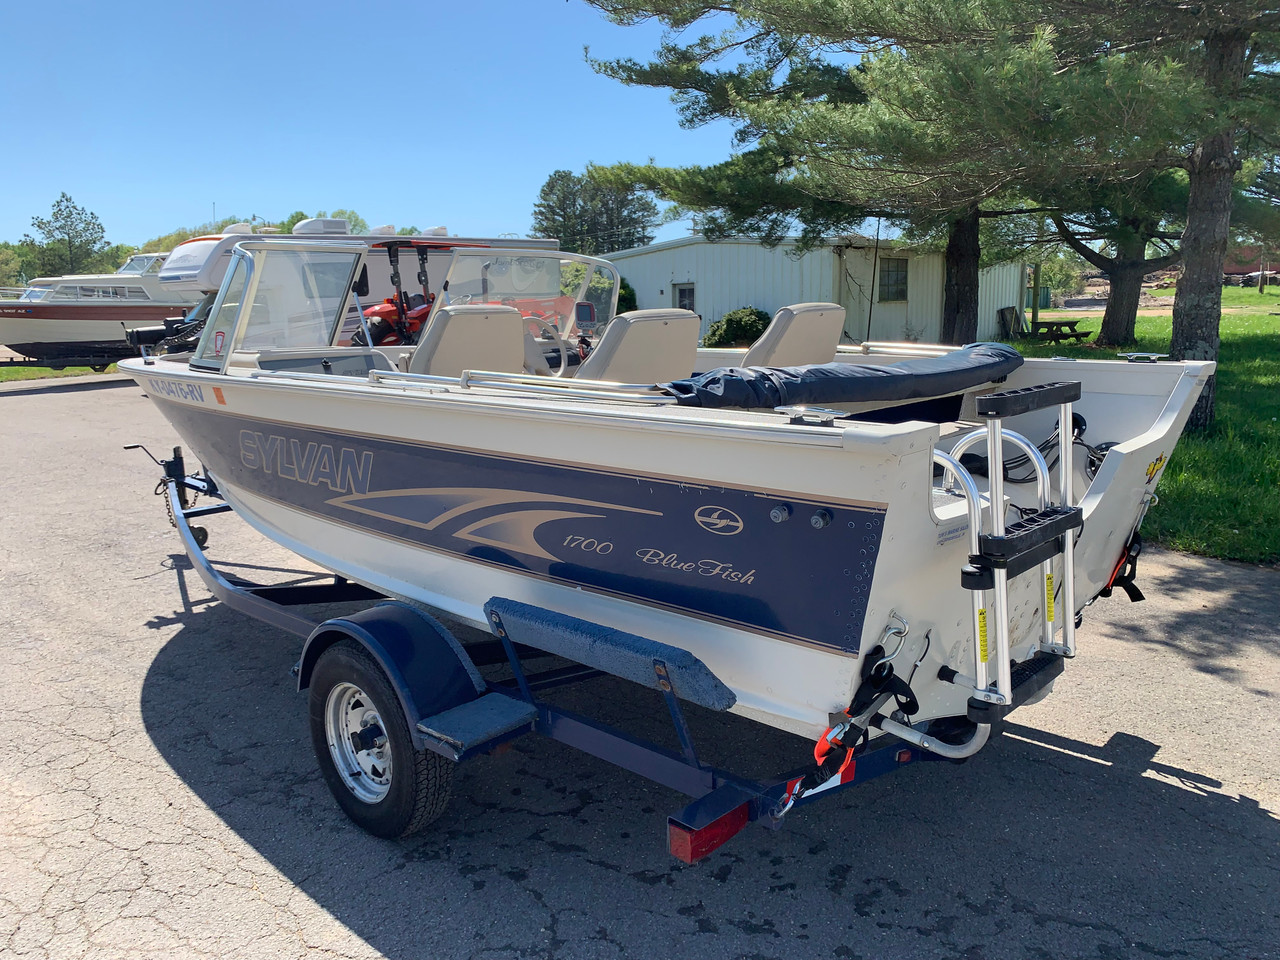 1998 Sylvan 1700 Blue Fish 17' Aluminum Deep-V Walk Through Winshield Fishing Boat with Trailer